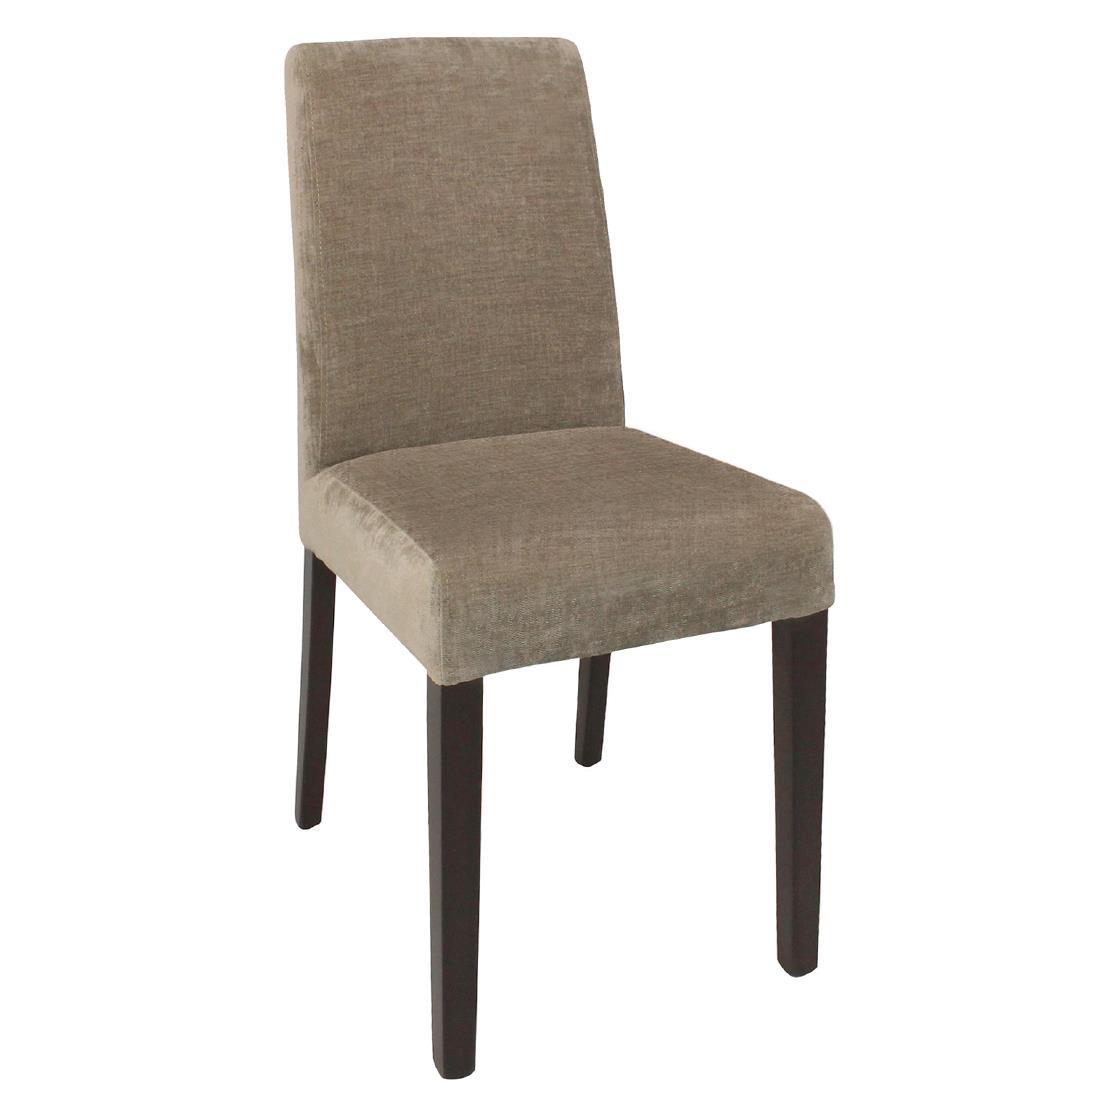 Standard Dining Chair - Beige